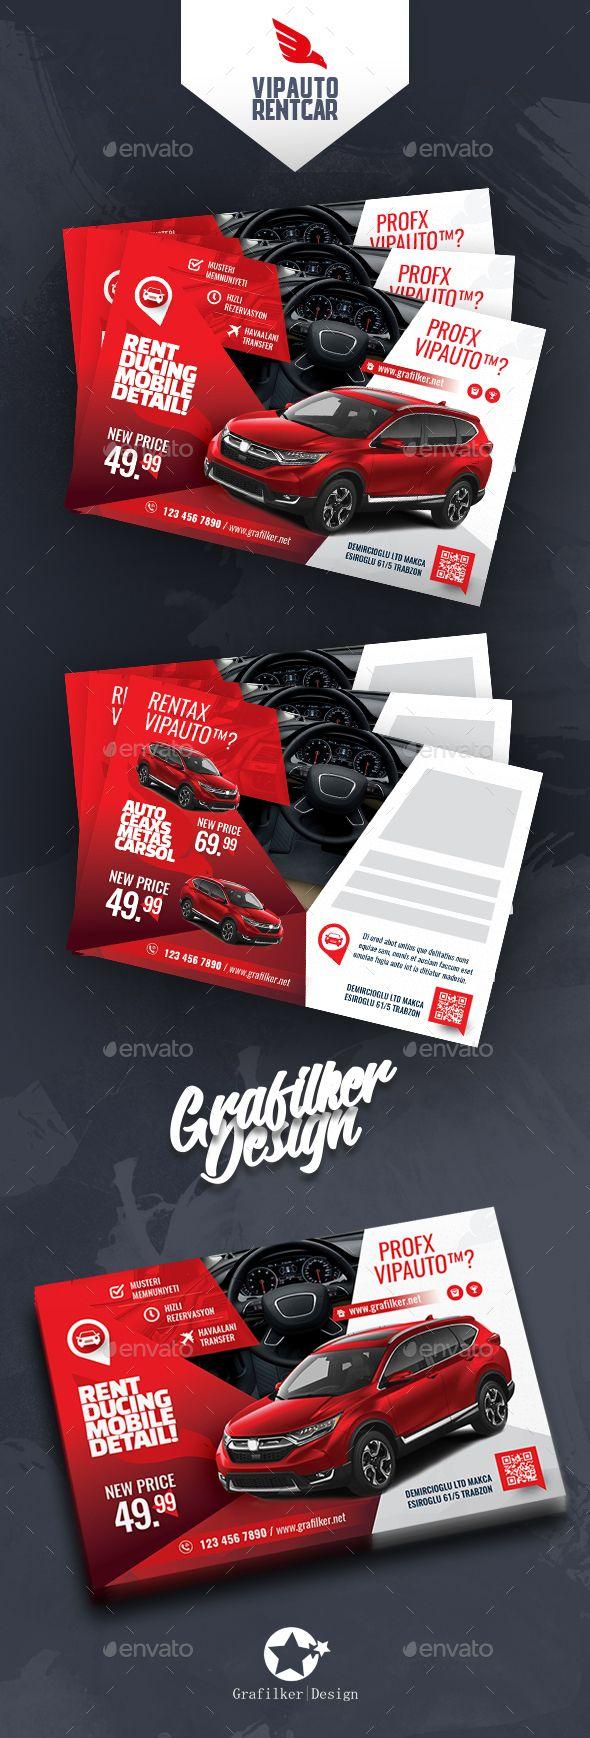 Rent A Car Postcard Template PSD, InDesign INDD Postcard